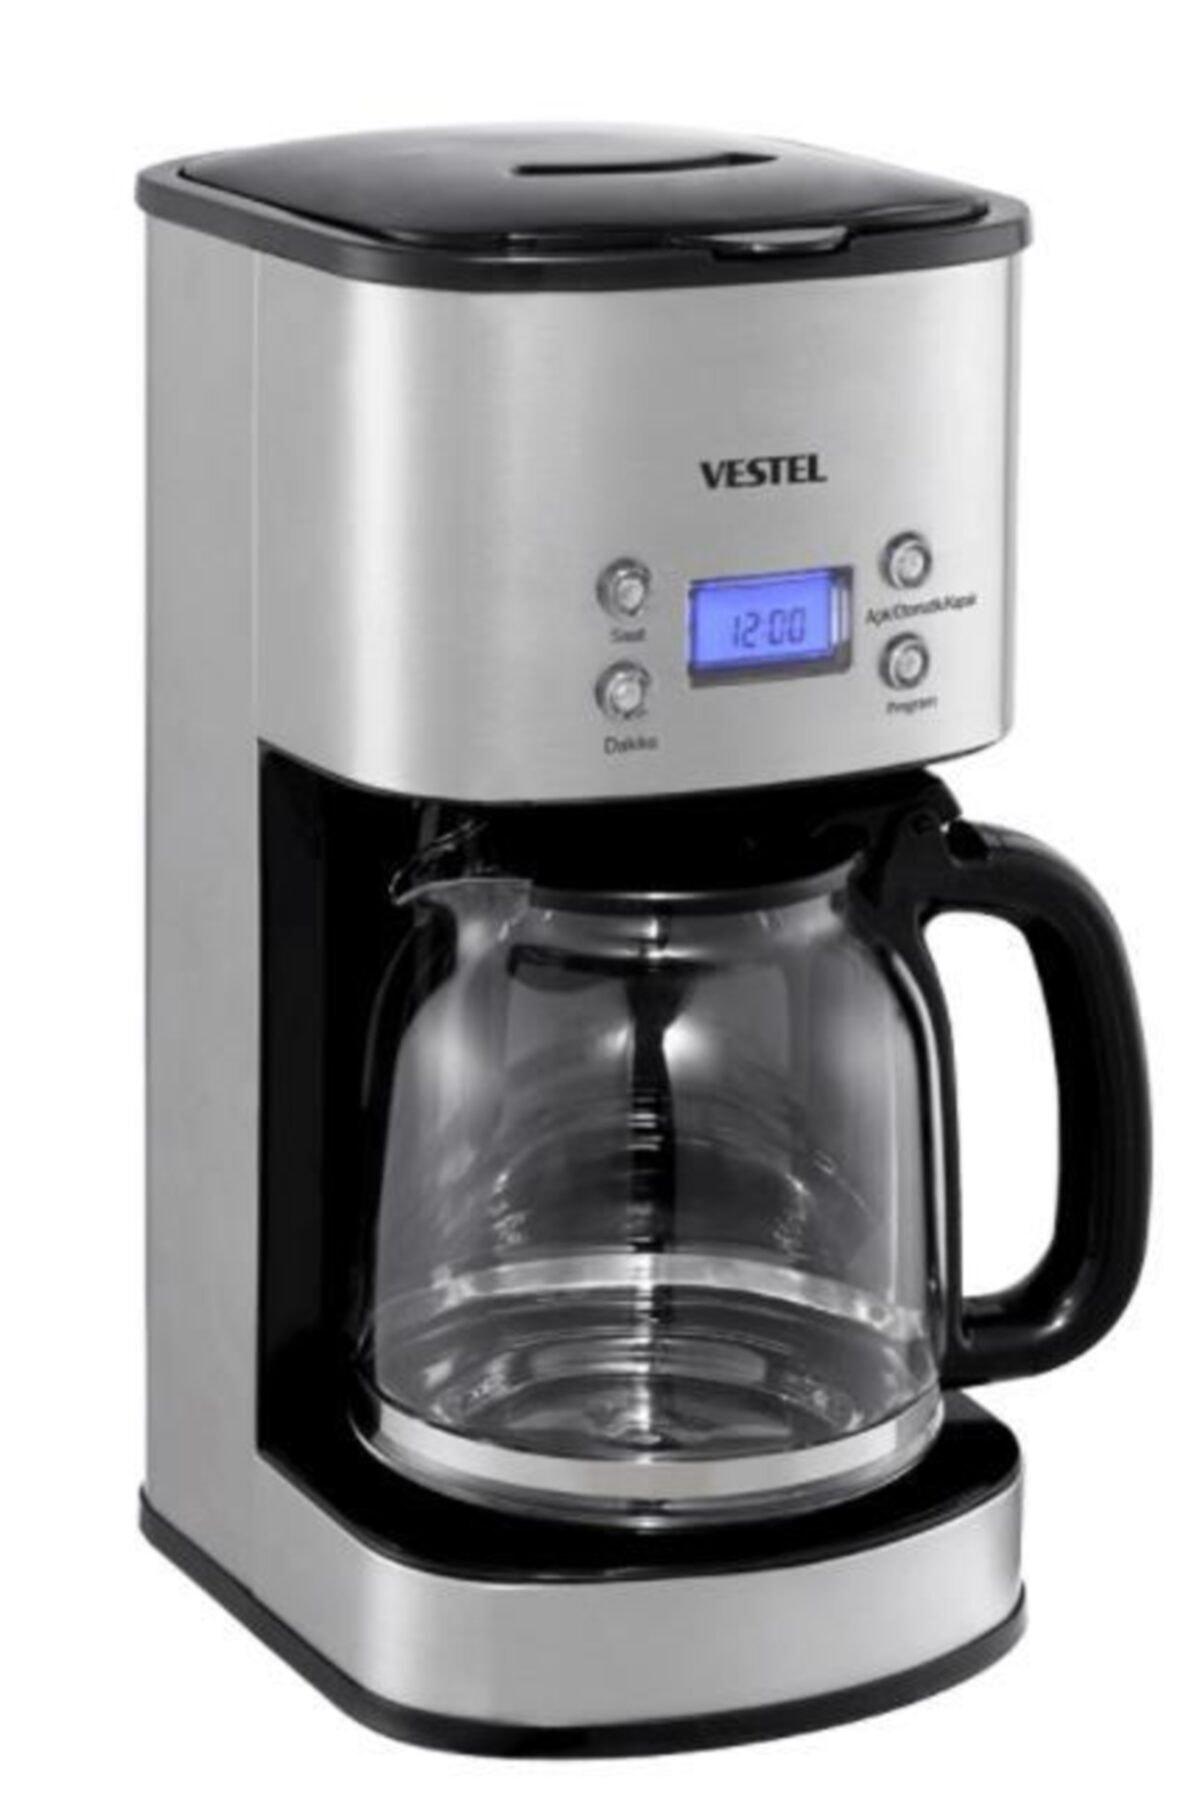 Vestel Sefa K3000 Inox Filtre Kahve Makinesi 1